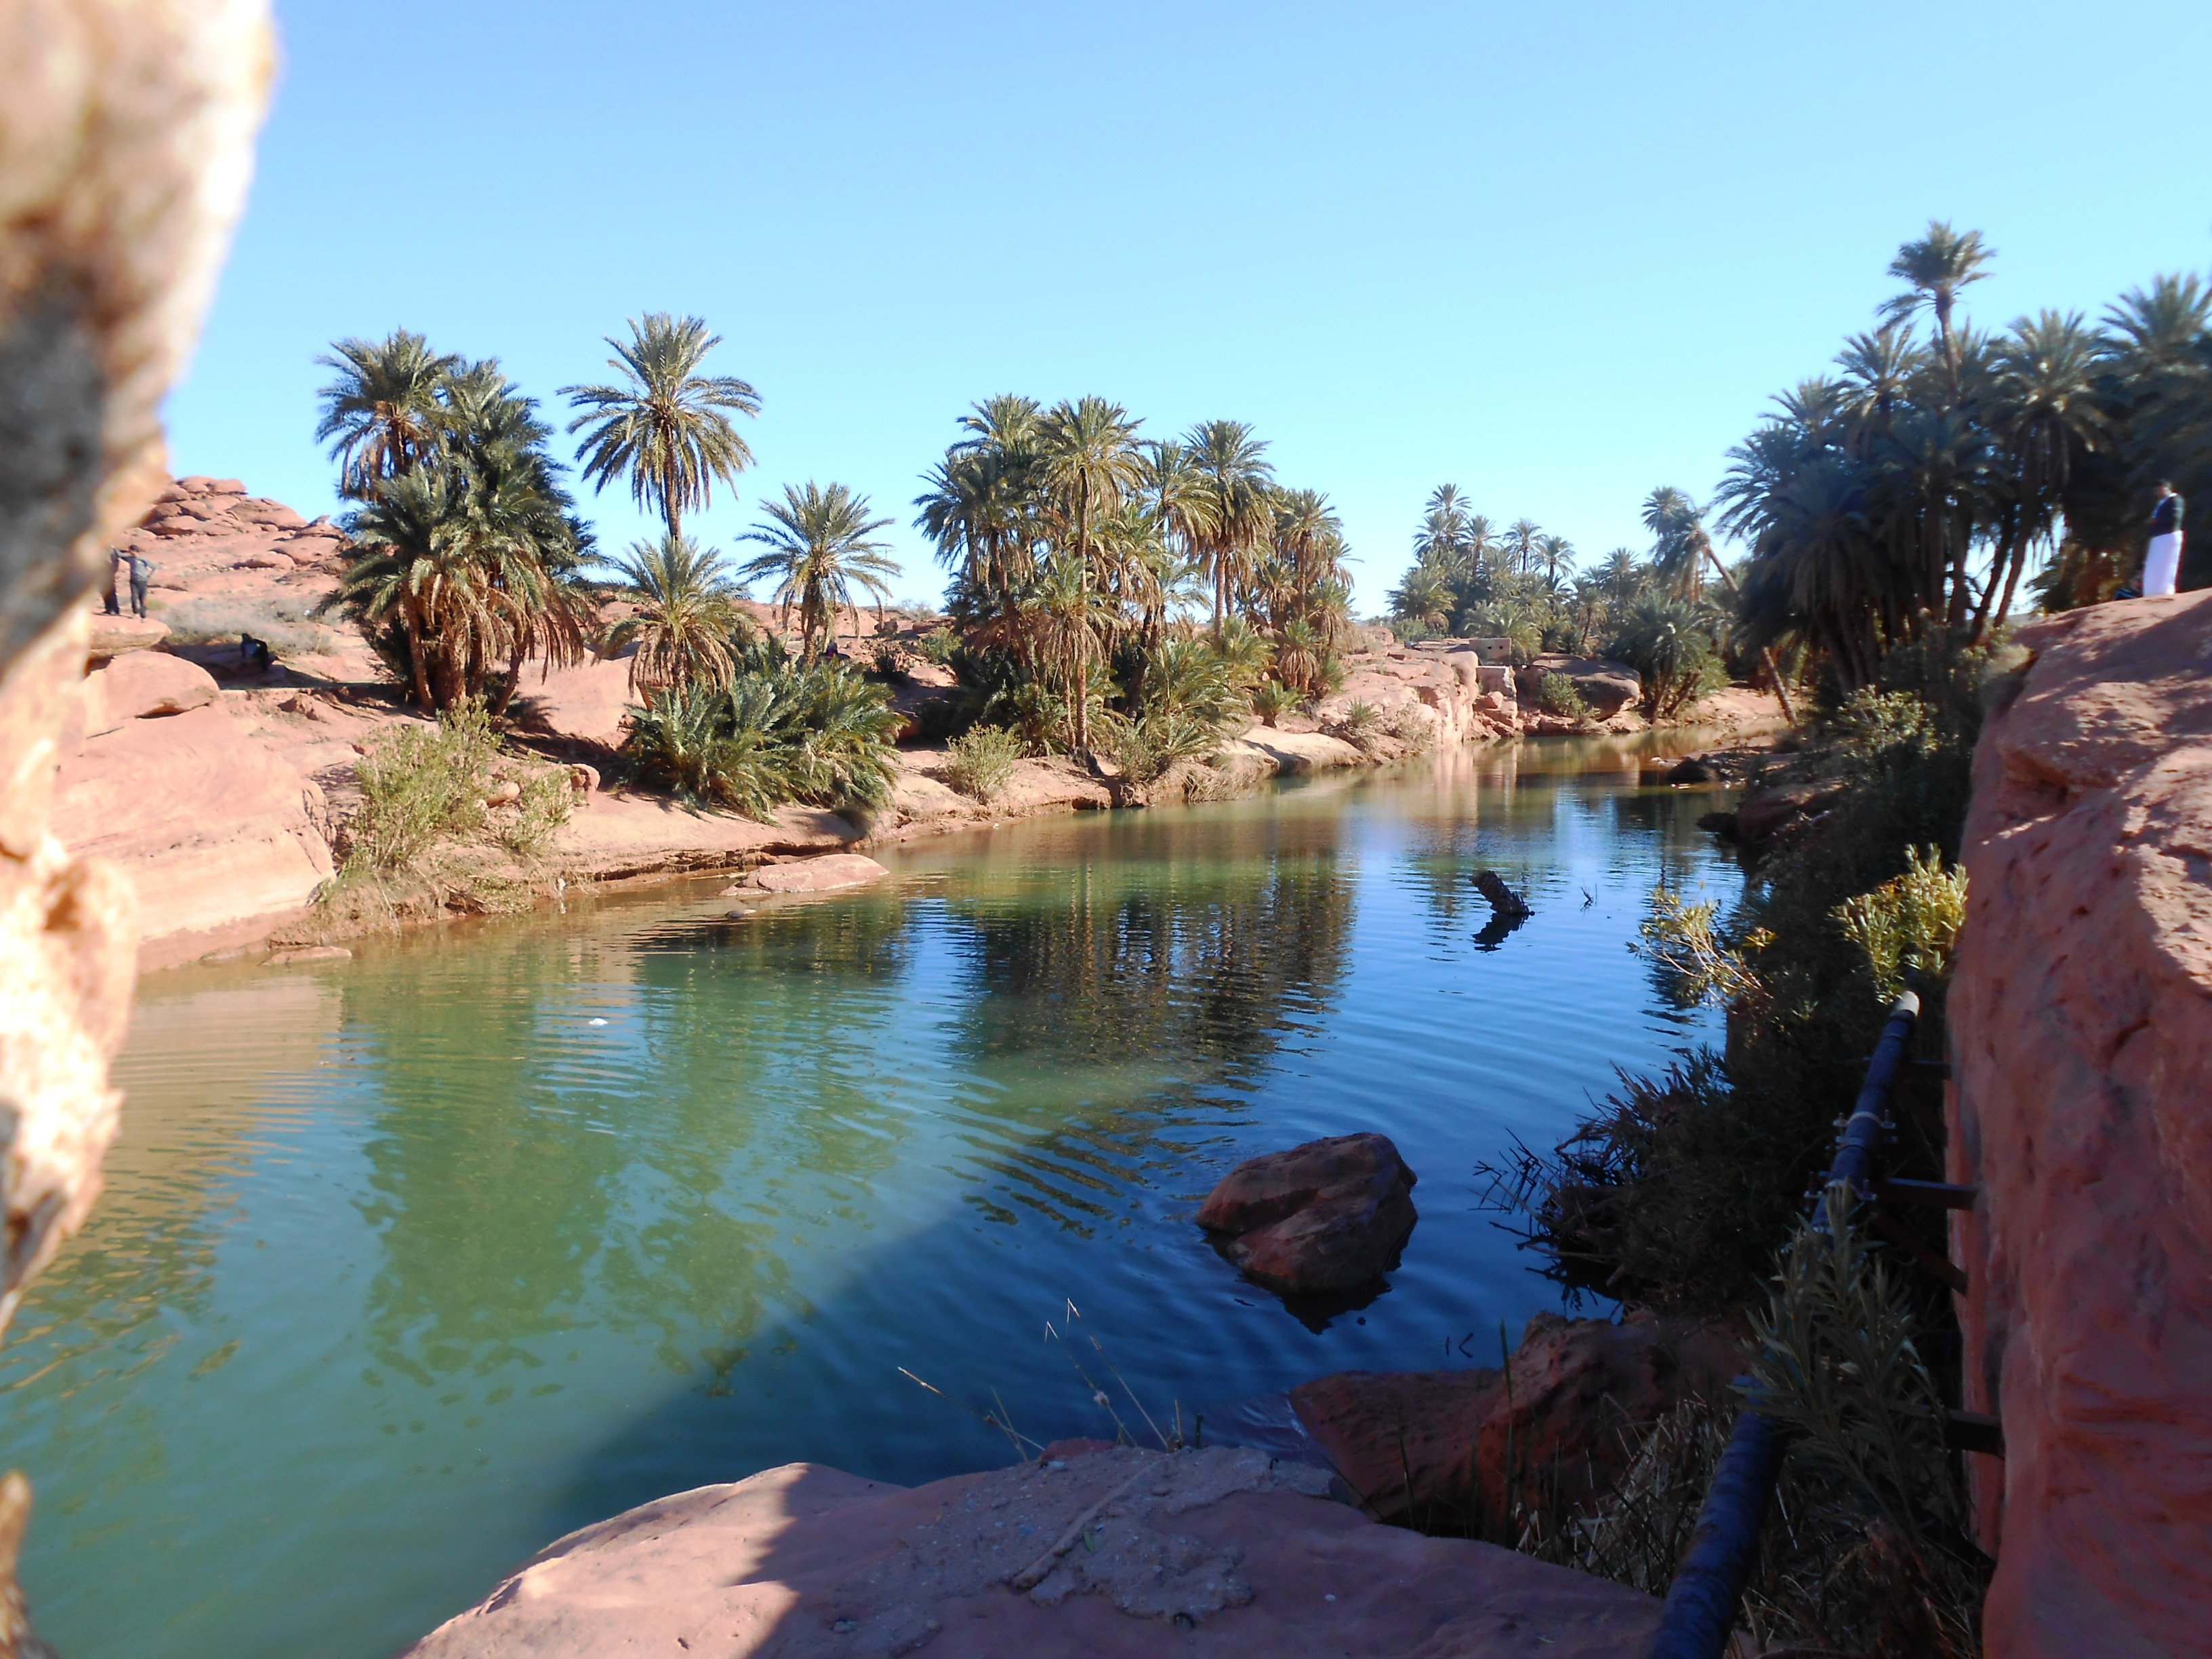 morocco-taroudant-oasis-tiout1532101683.JPG